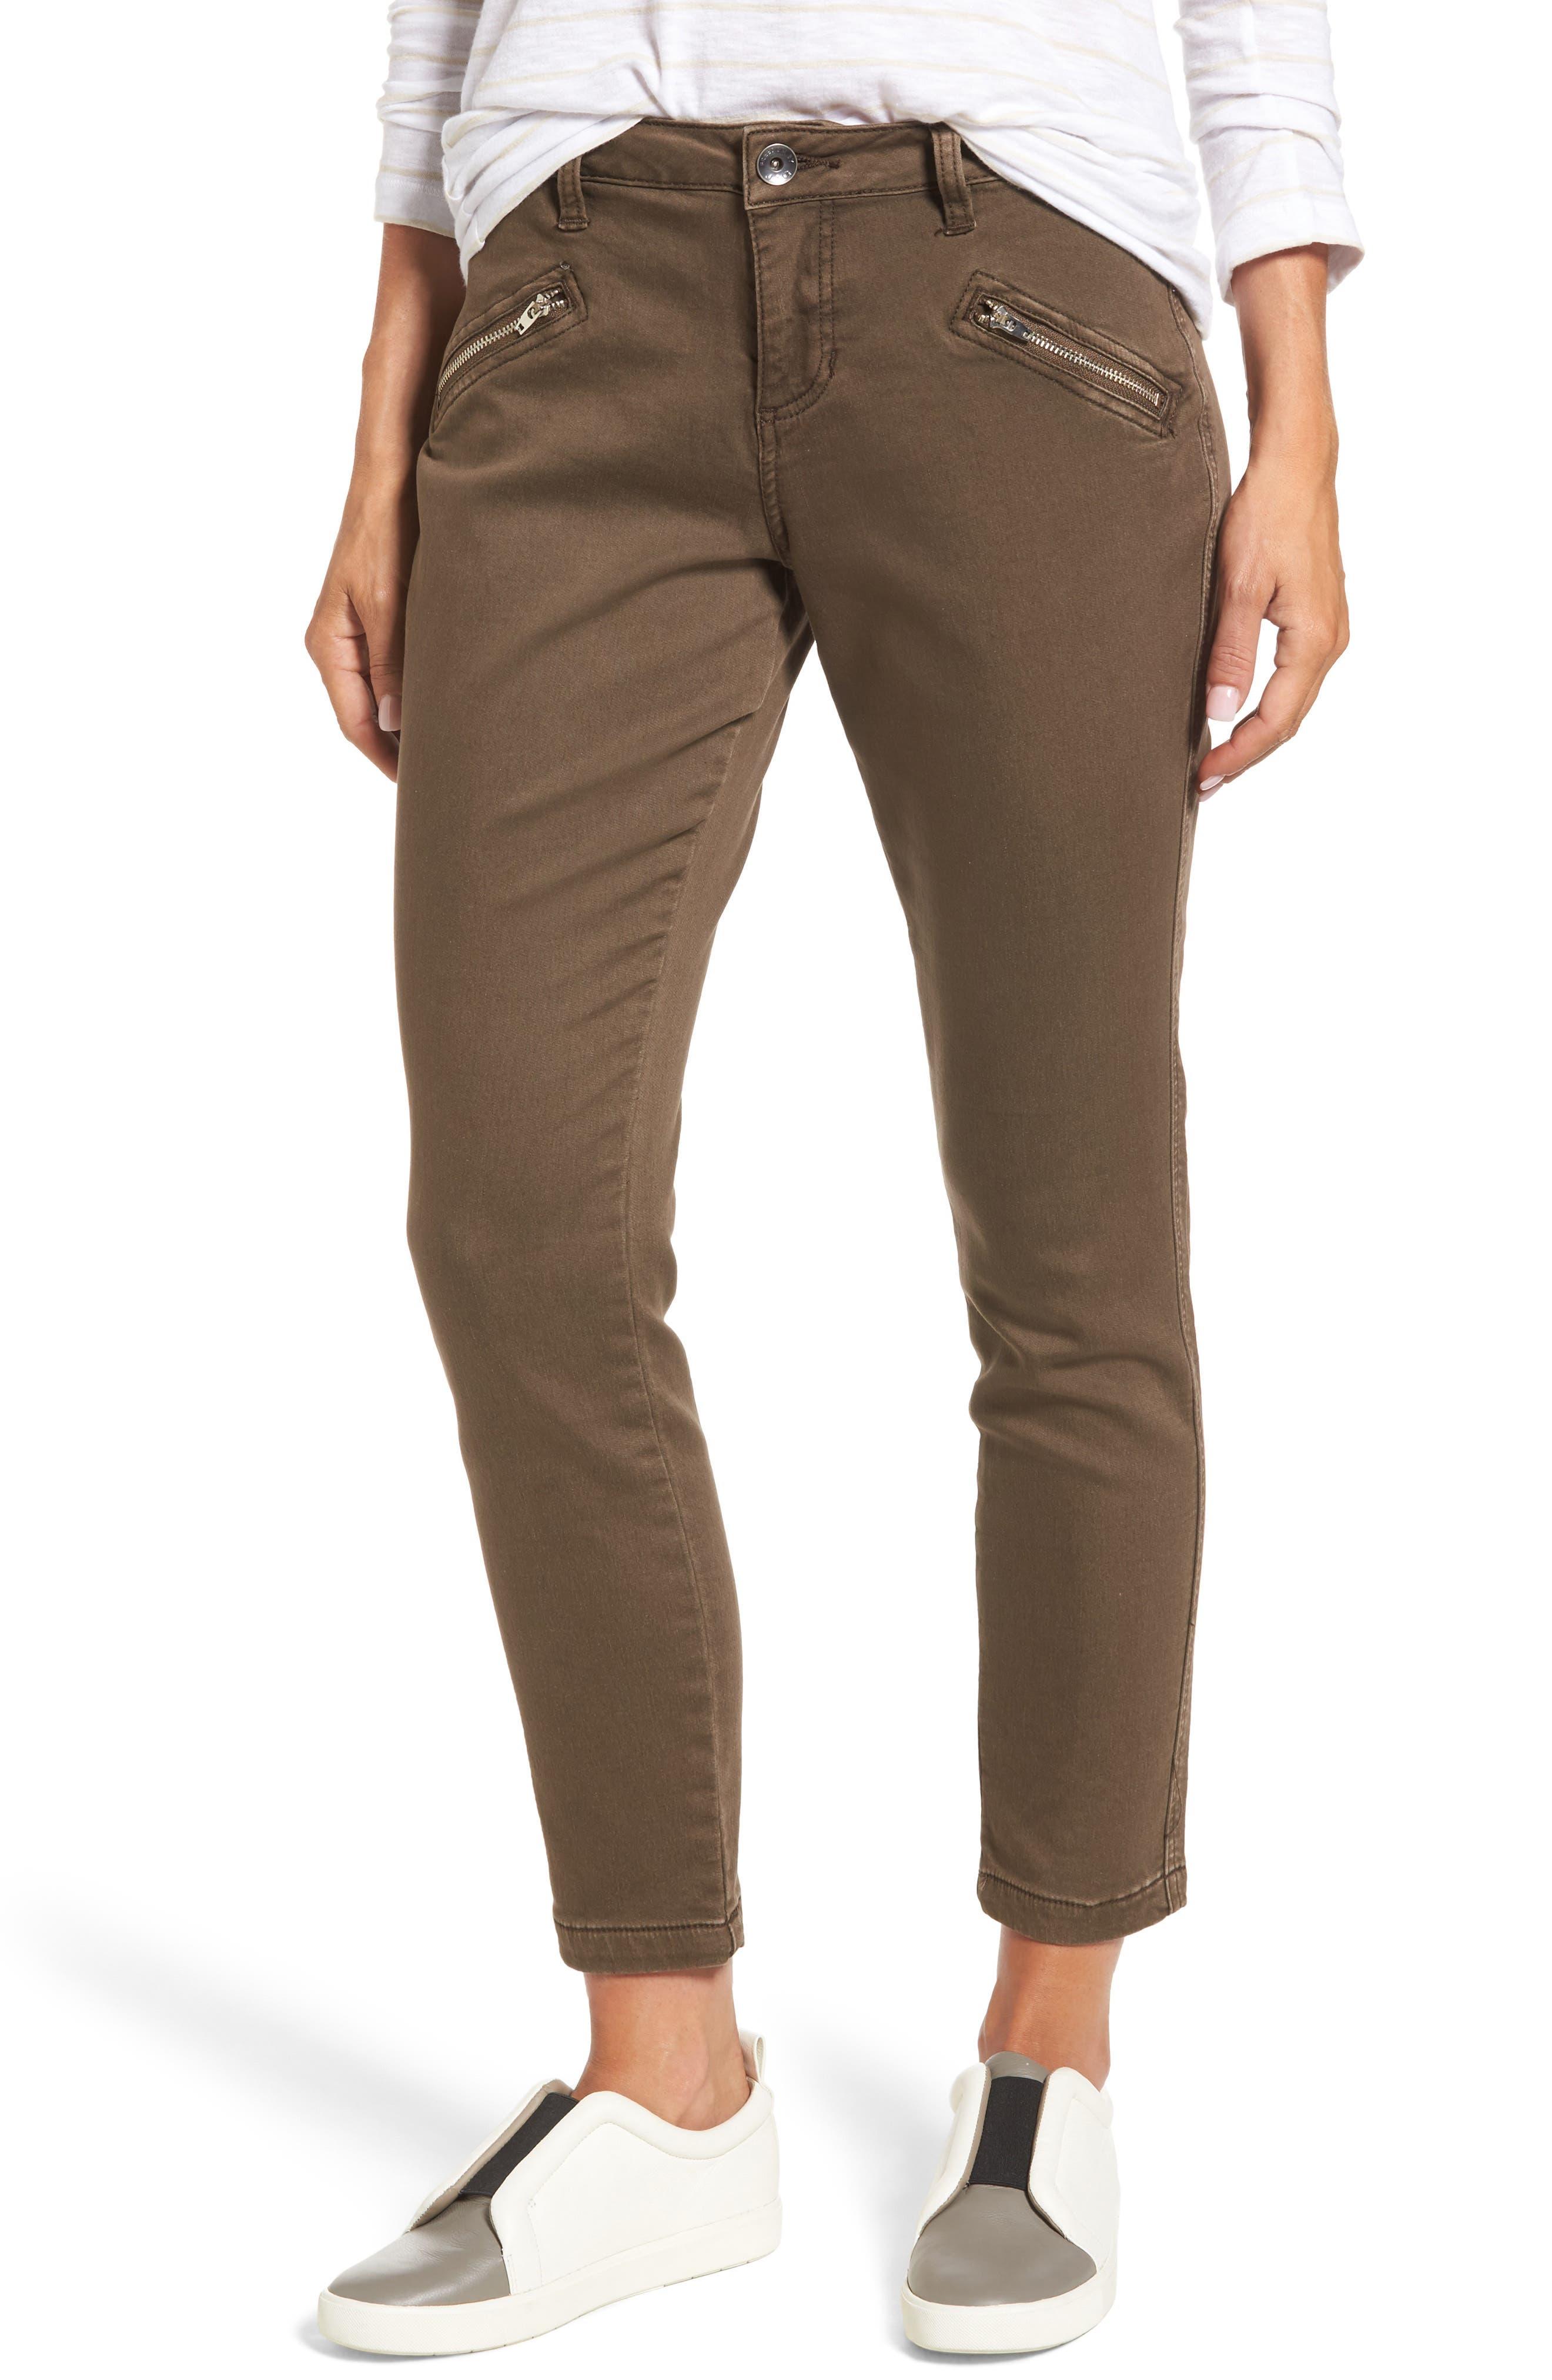 Ryan Knit Skinny Jeans,                         Main,                         color, Saddle